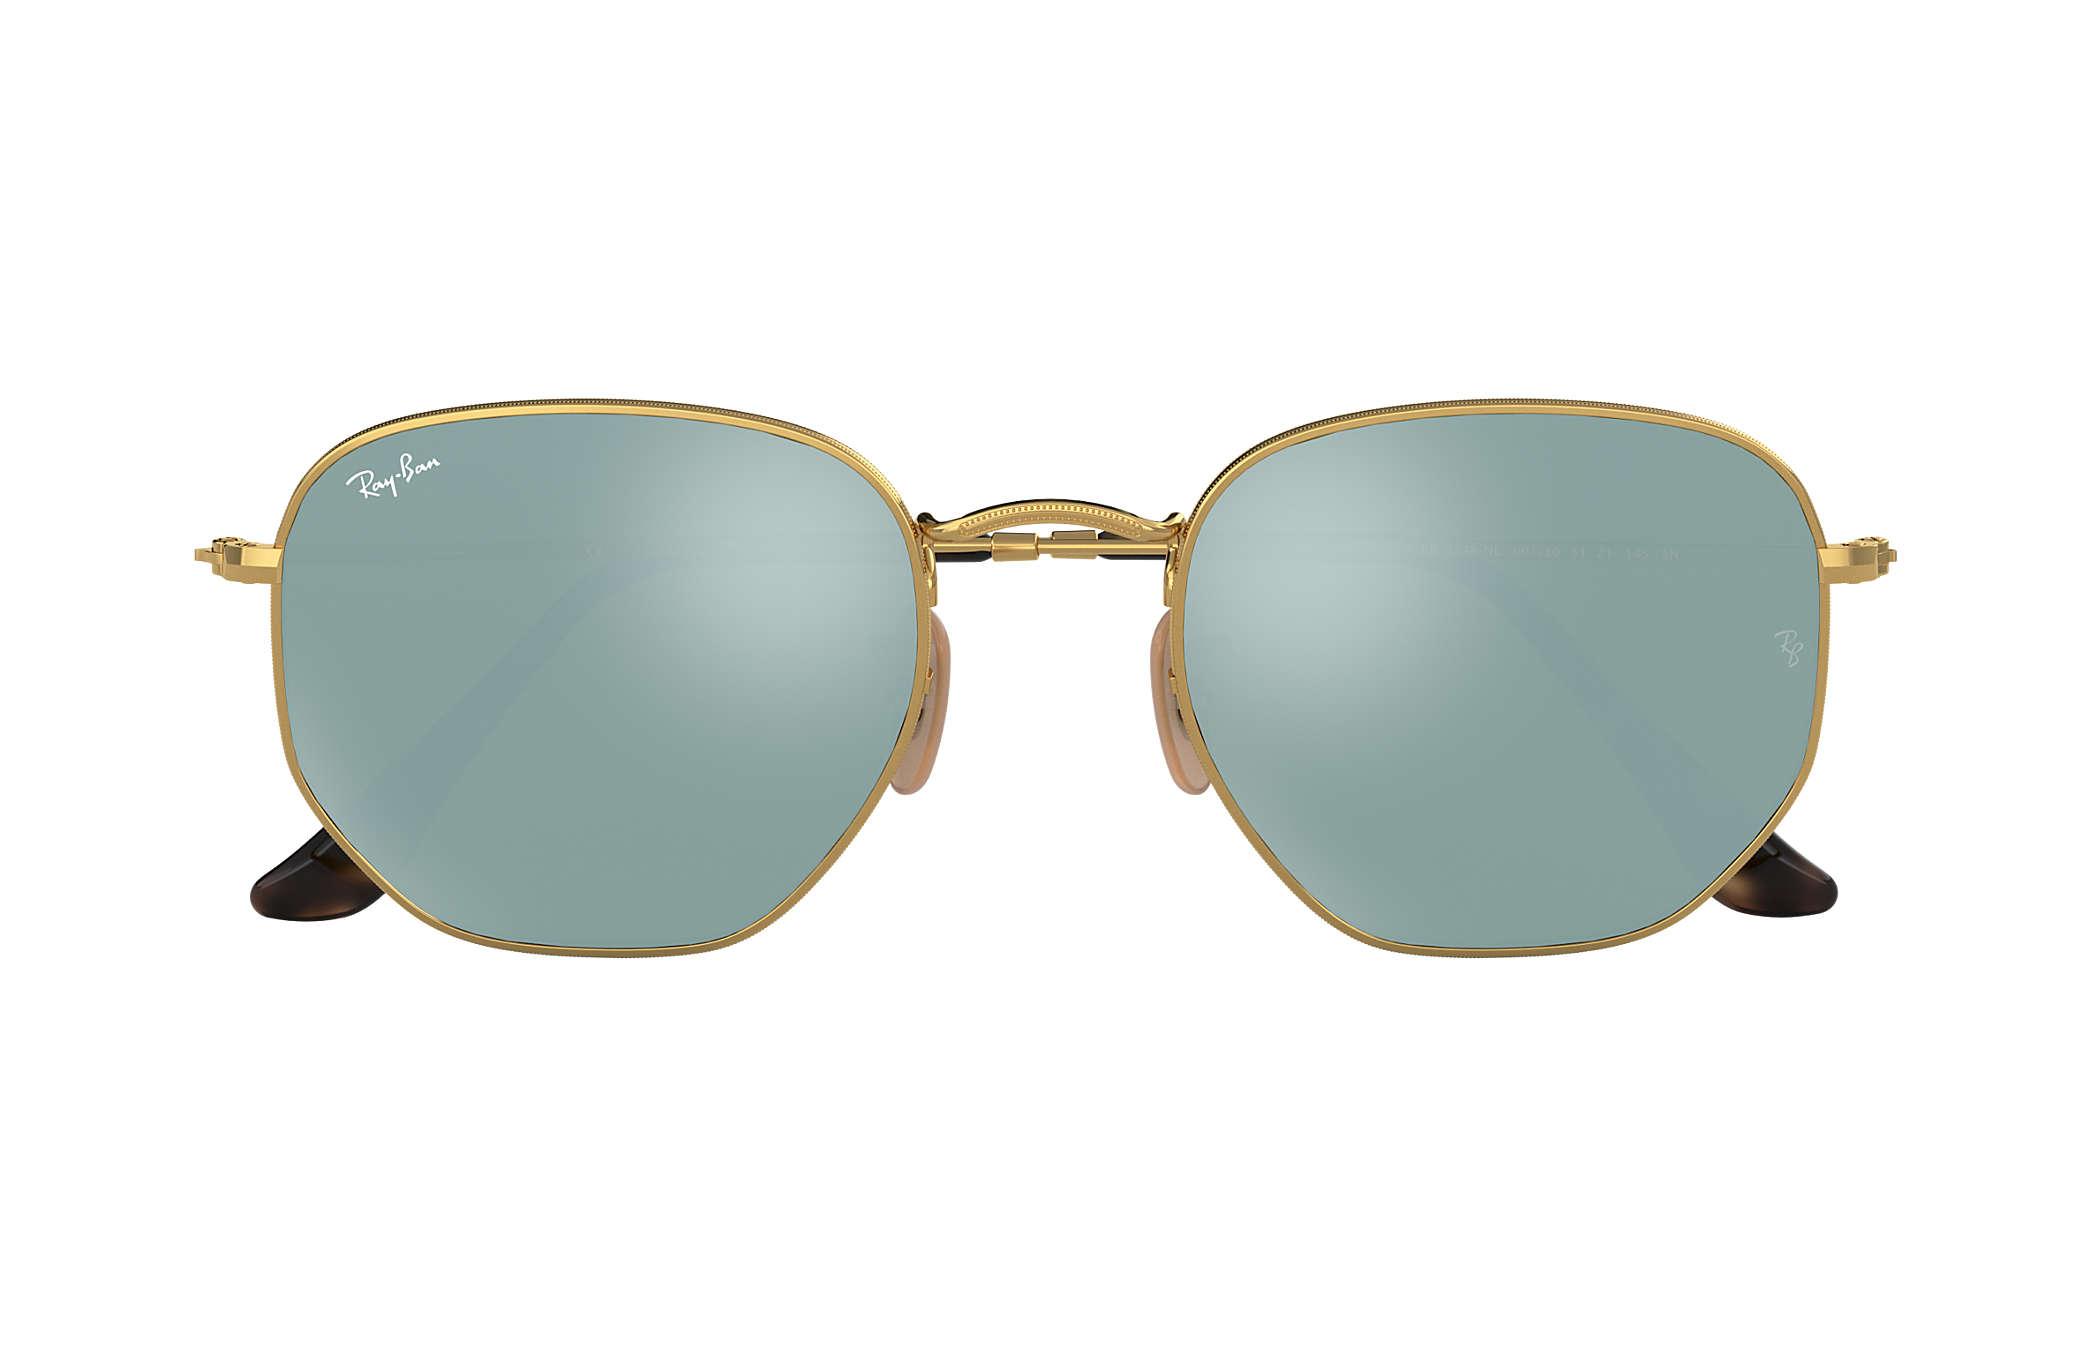 Ray-Ban Hexagonal Flat Lenses RB3548NL Ouro - Metal - Lentes Prata ... 99539d2d22